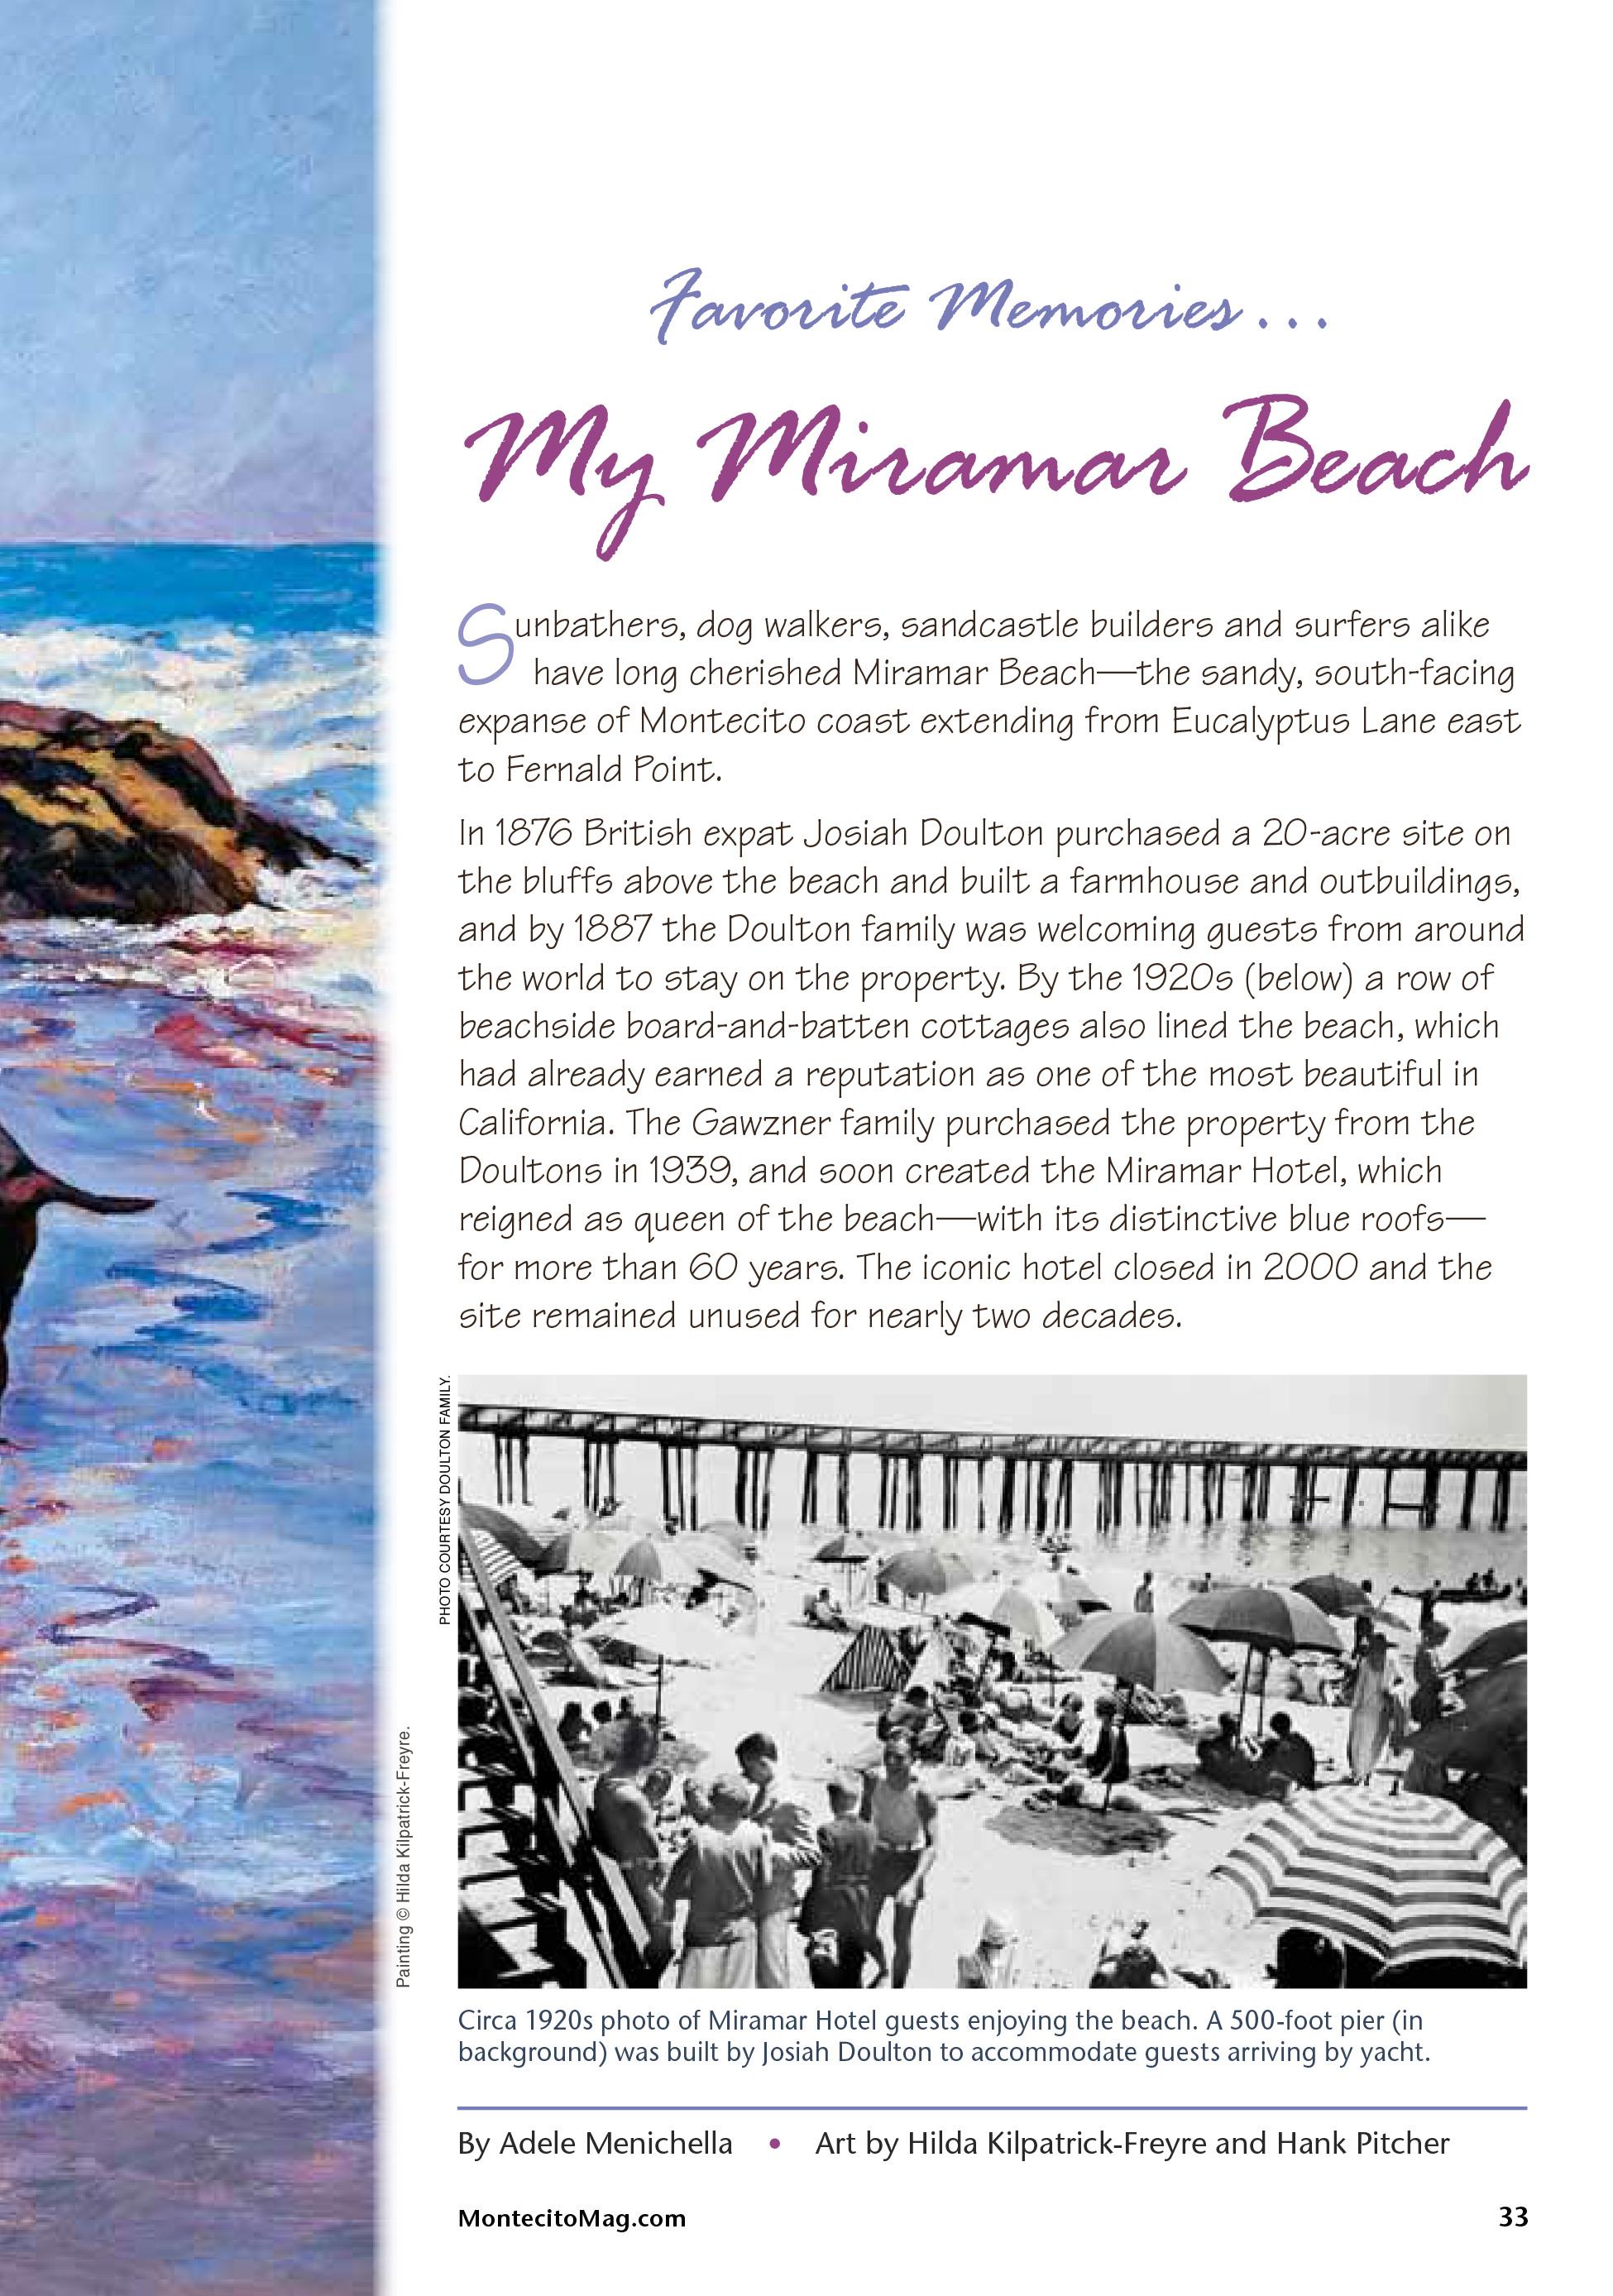 MM--iramar-Beach-Memories-2.jpg